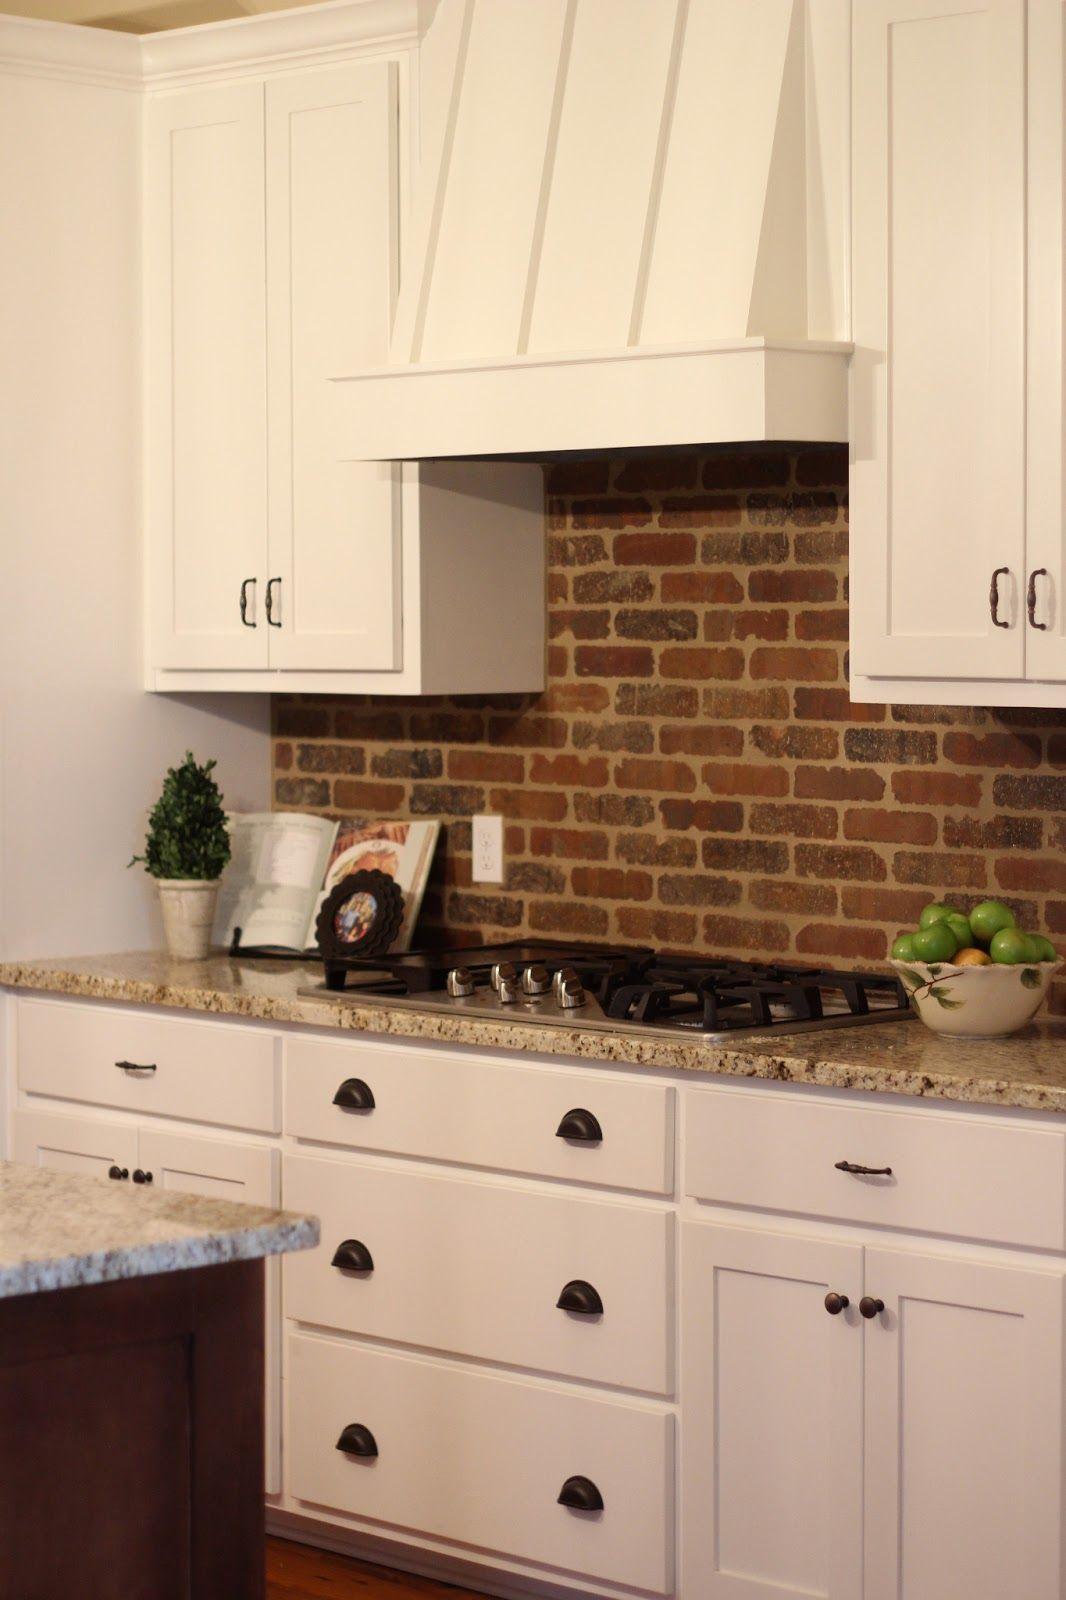 A Modern Farmhouse Trendy kitchen backsplash, Brick